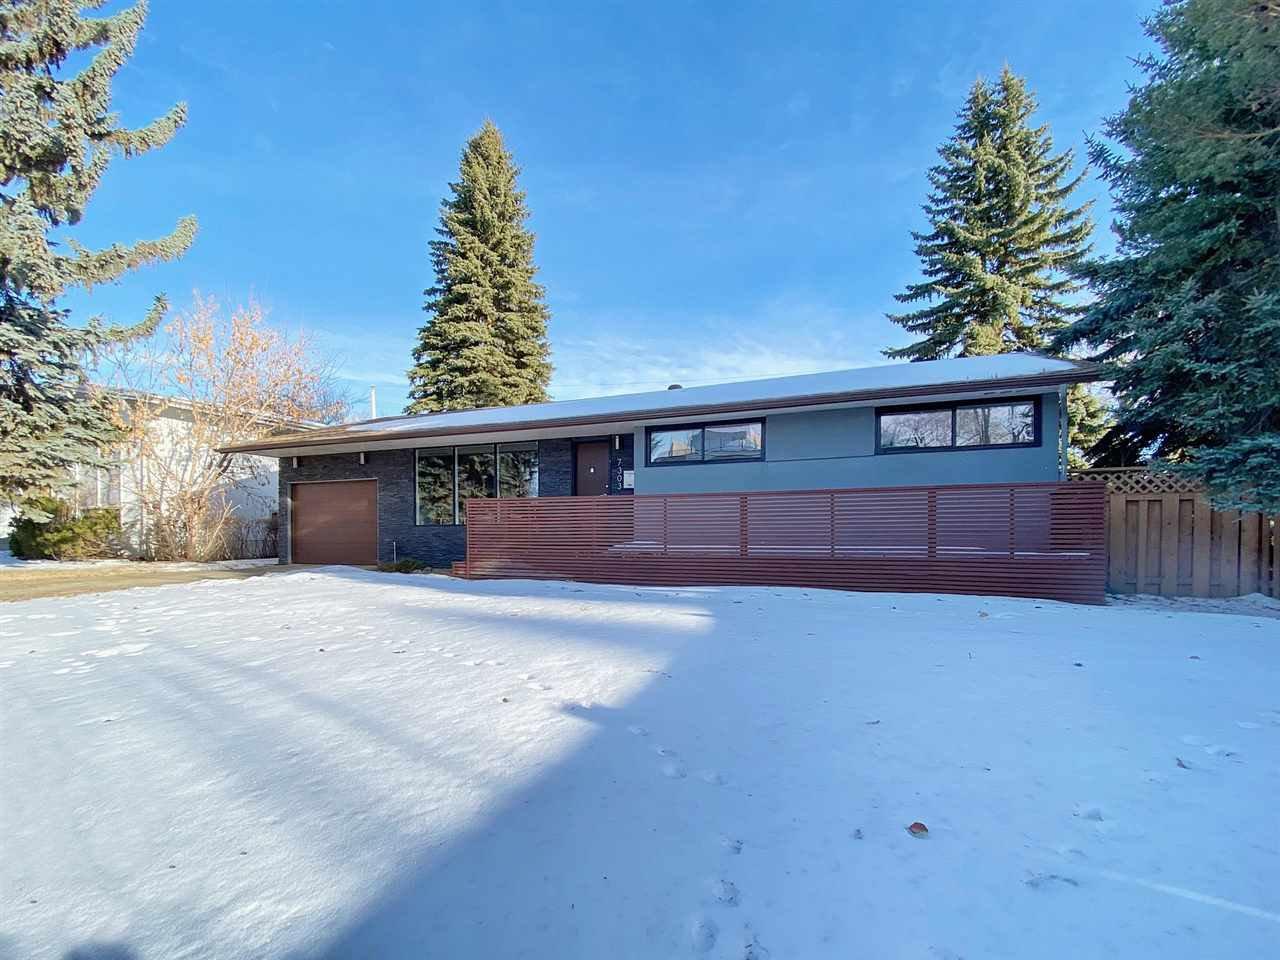 Main Photo: 7303 155 Street in Edmonton: Zone 22 House for sale : MLS®# E4224729